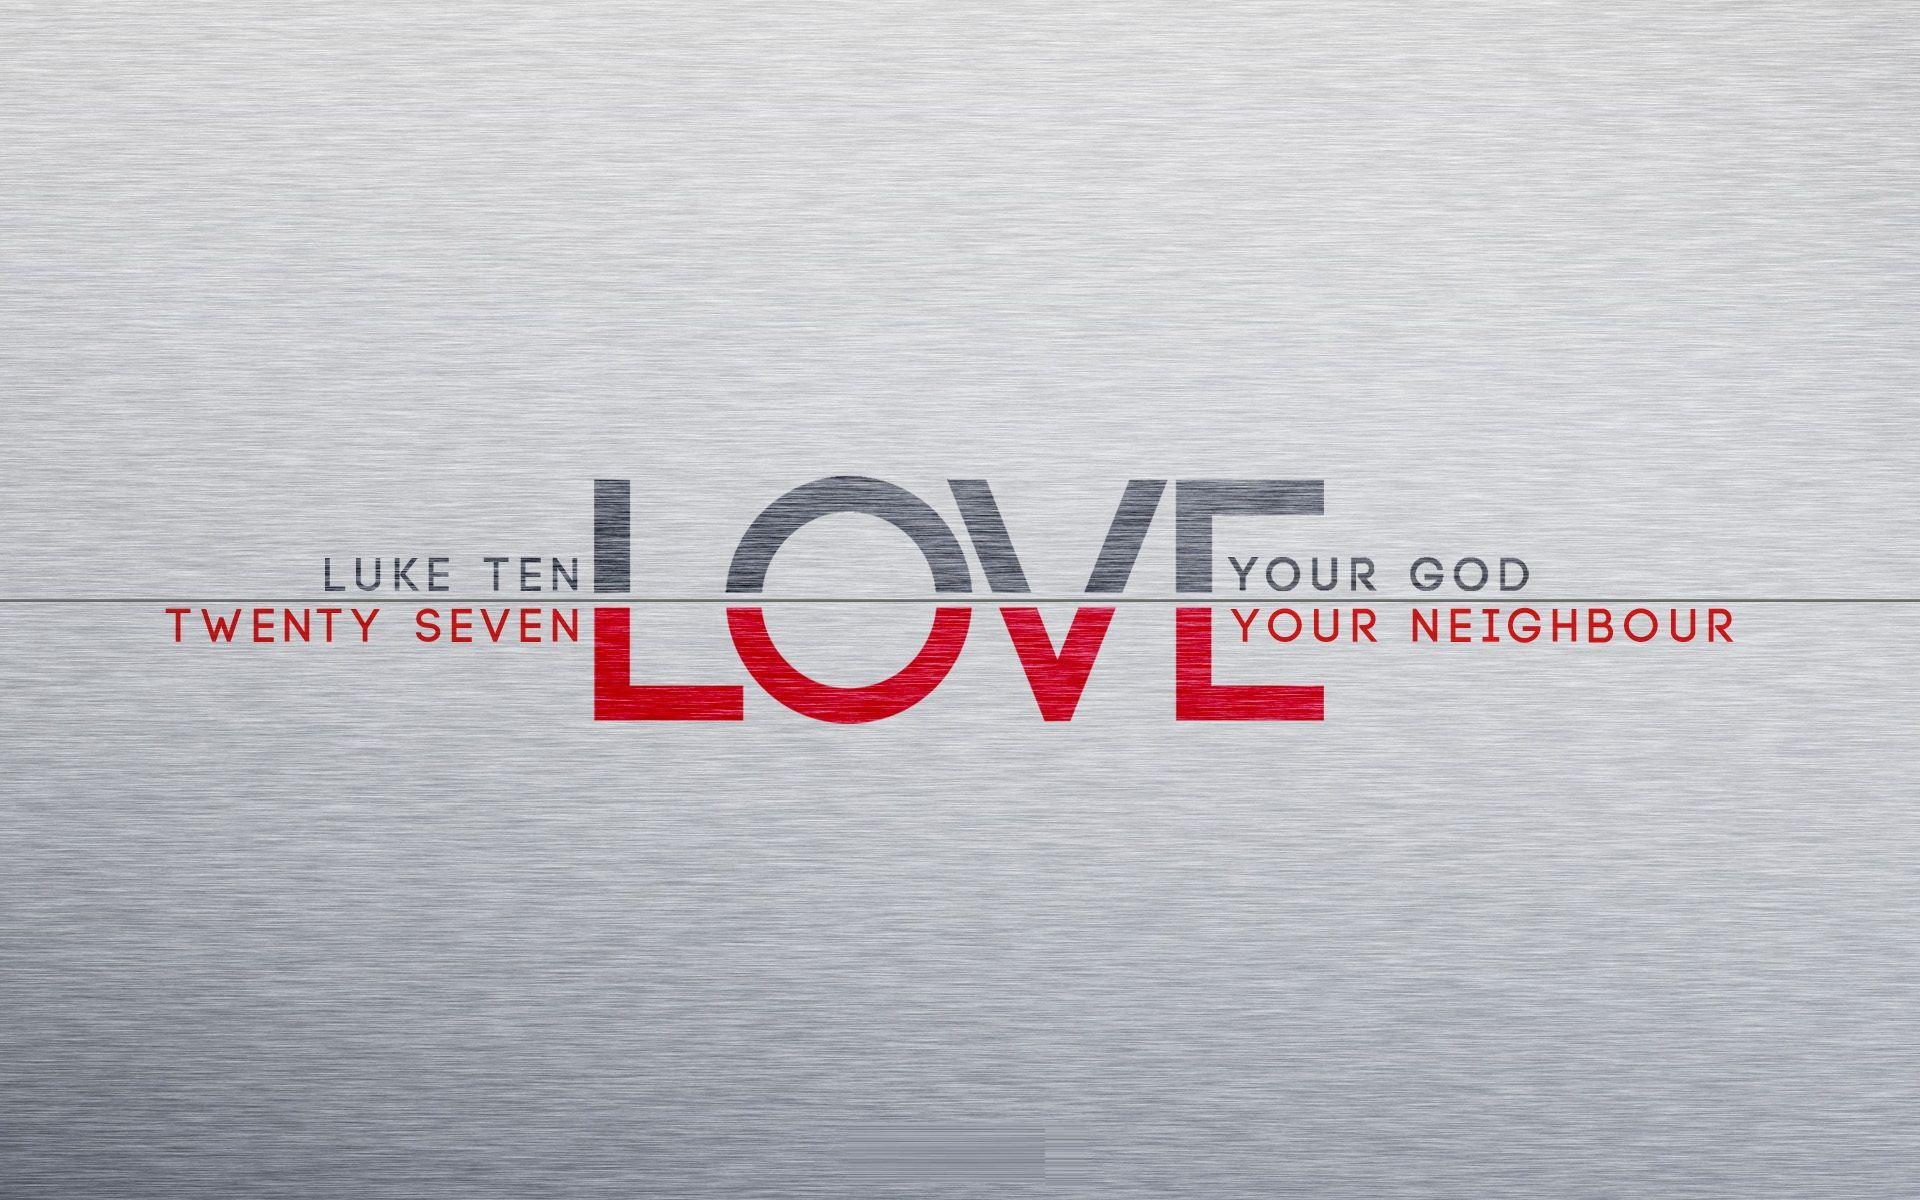 Beautiful Wallpaper Love God - a52c83b2eee59d31a18a2bea0e6de058  Picture_41416.jpg